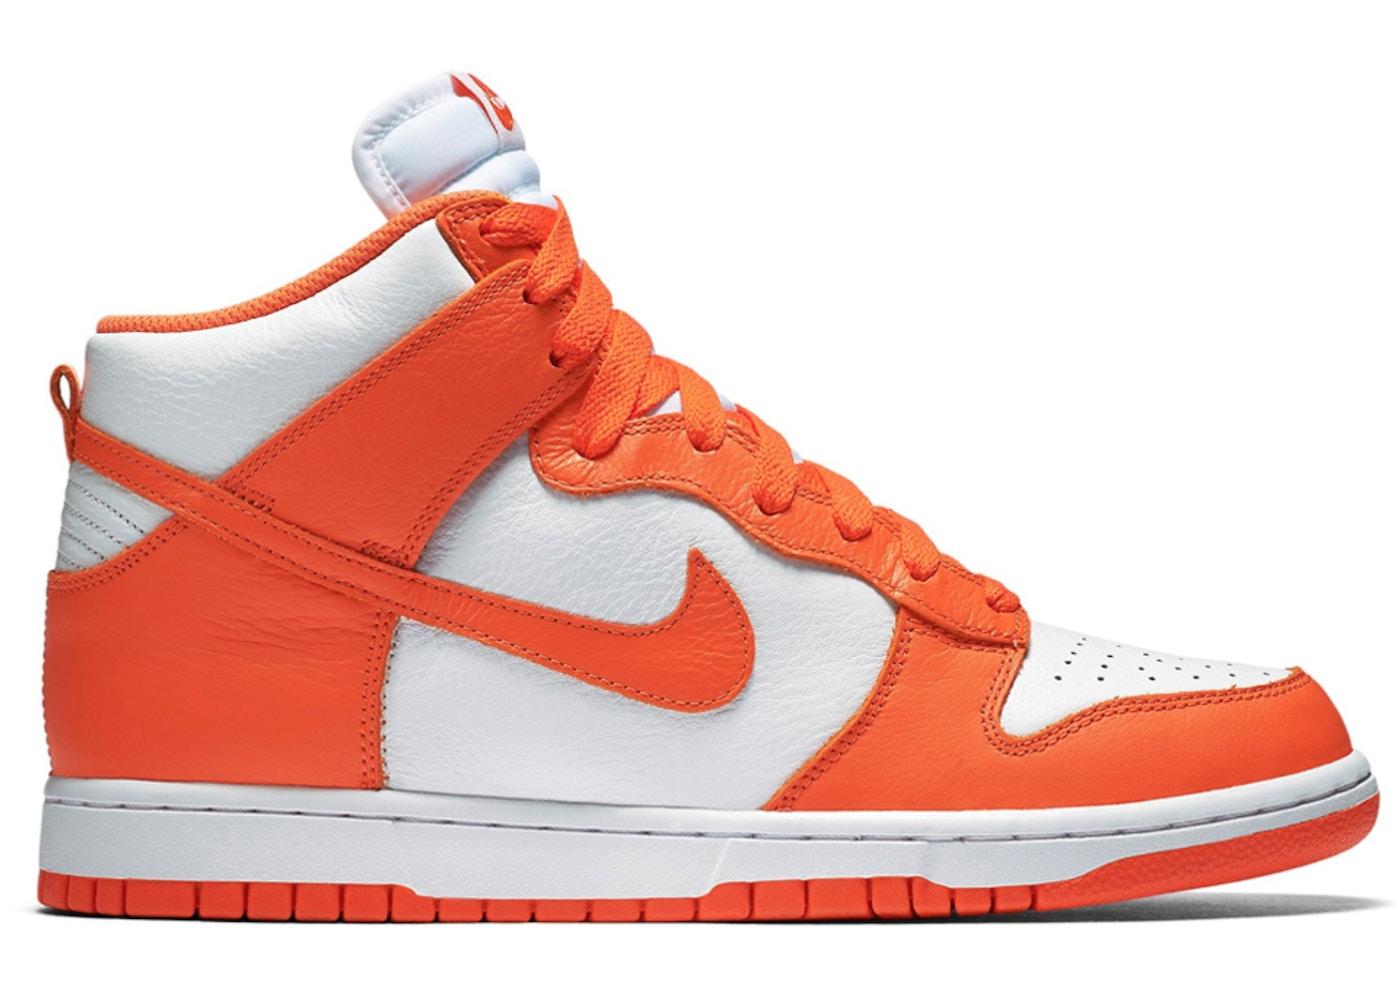 pretty nice c2ec3 0f4cf Buy Nike Basketball Dunk Shoes   Deadstock Sneakers